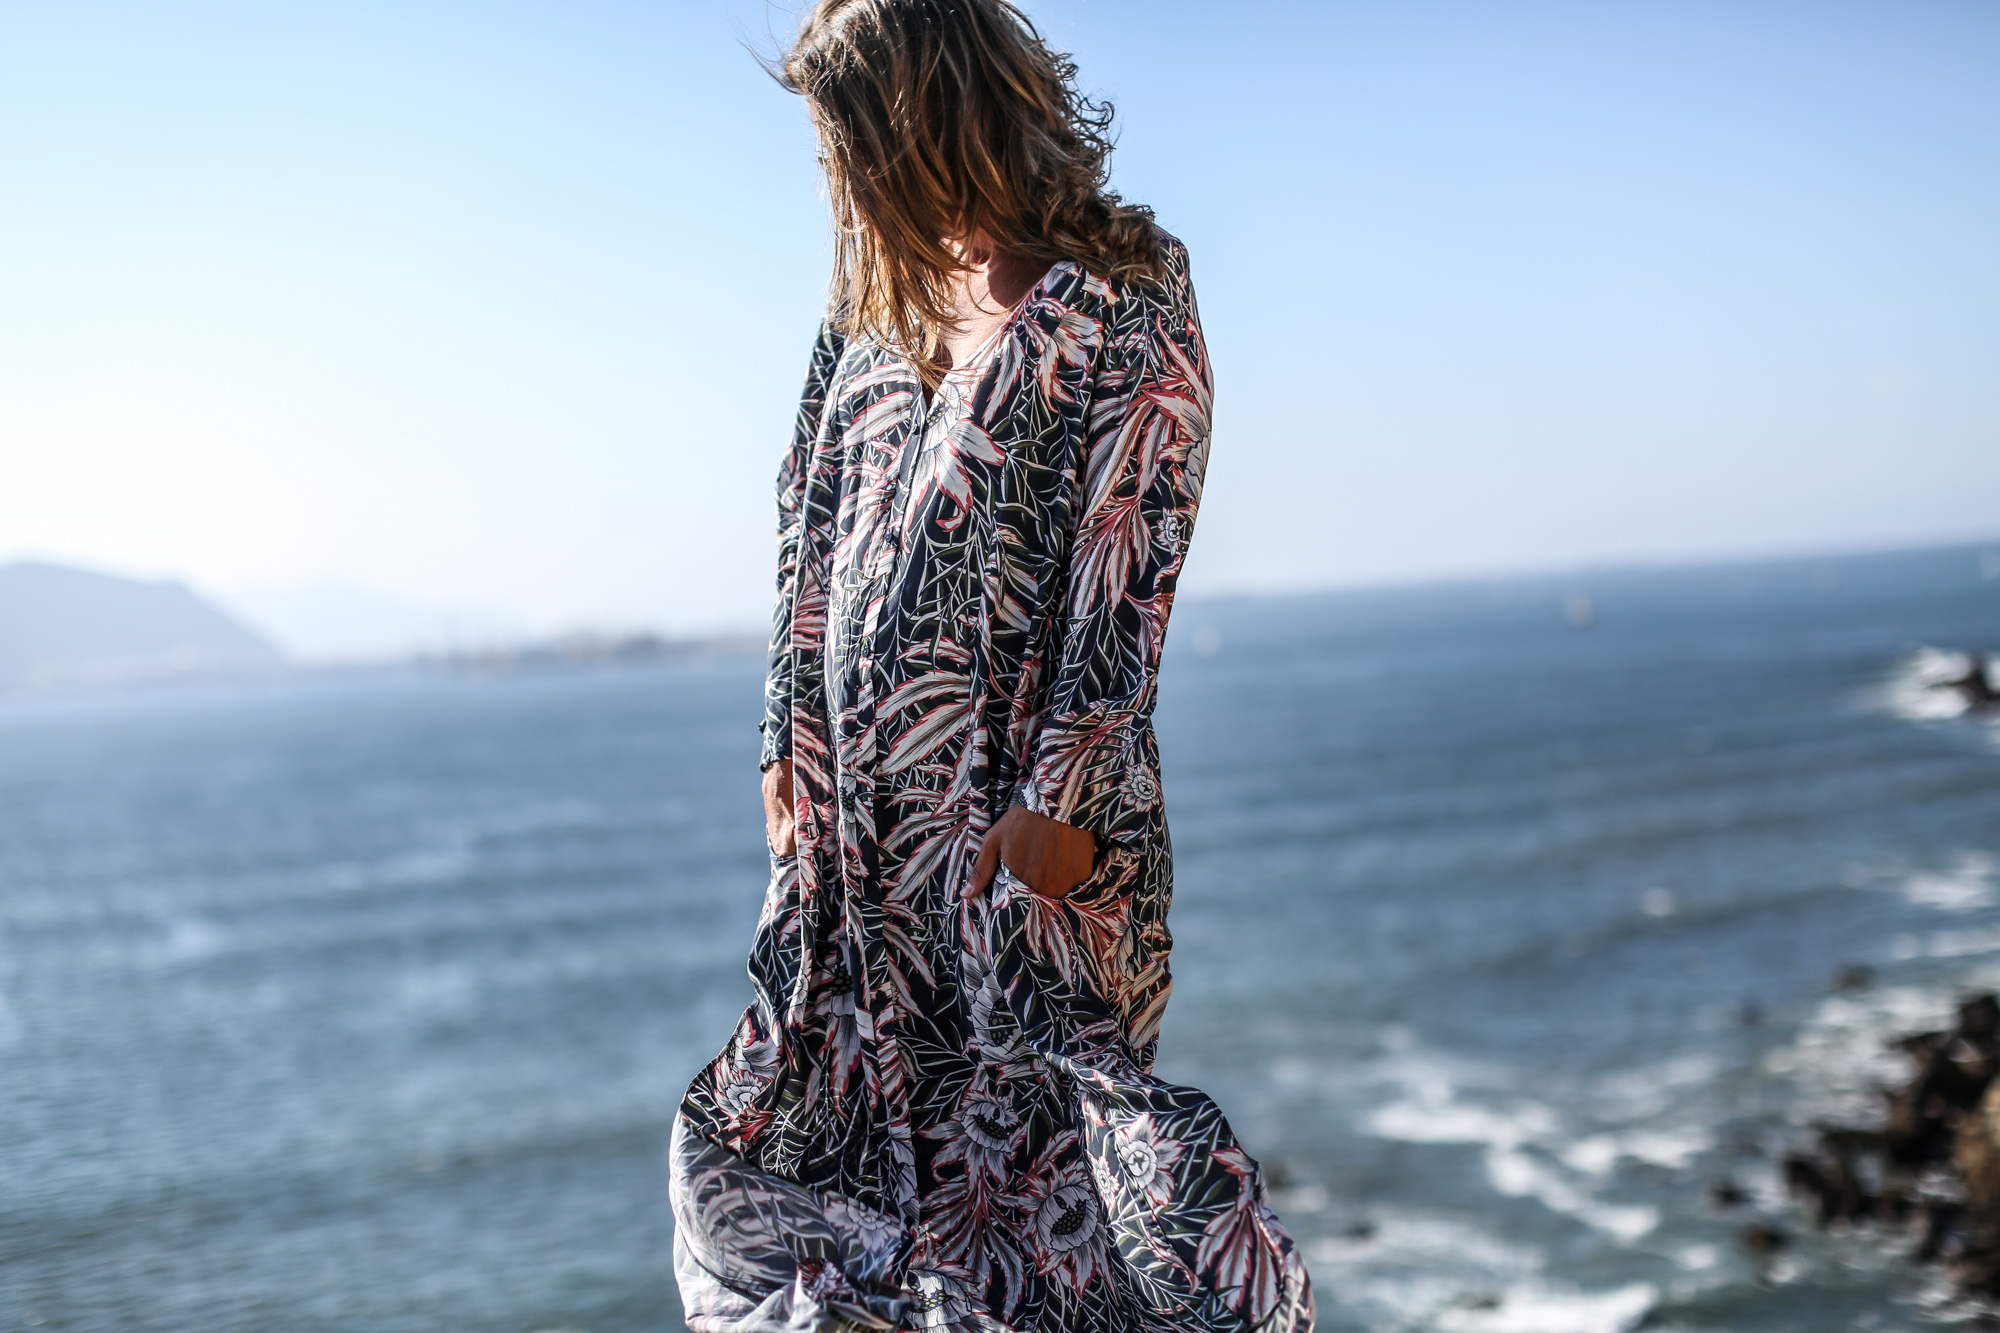 Clochet_streetstyle_fashionblogger_h&mtrend_longprintedshirtdress_rosegoldsuperga-6